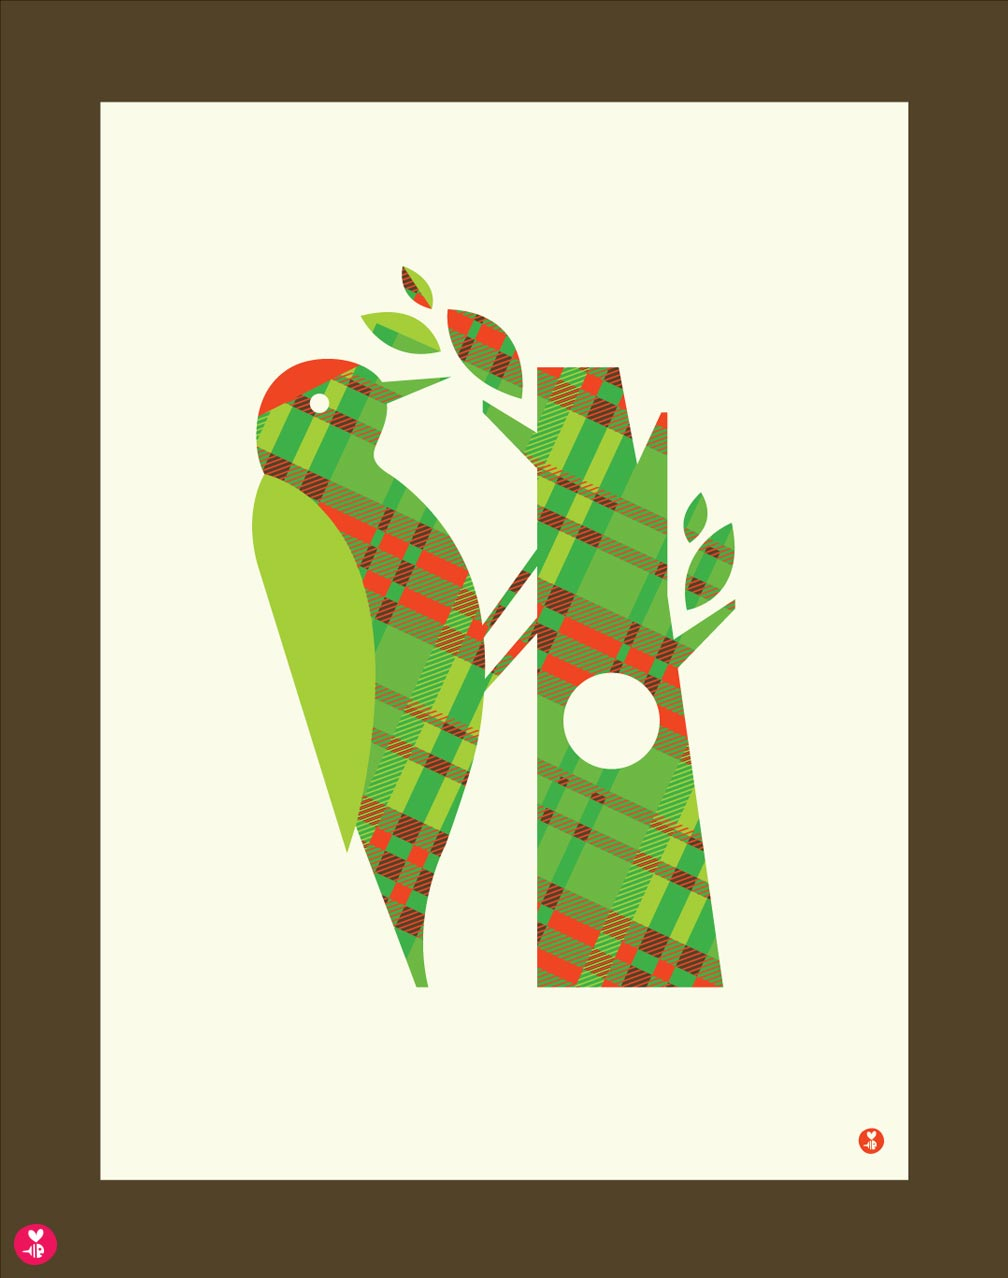 Plaid WoodpeckerLimited Edition Print